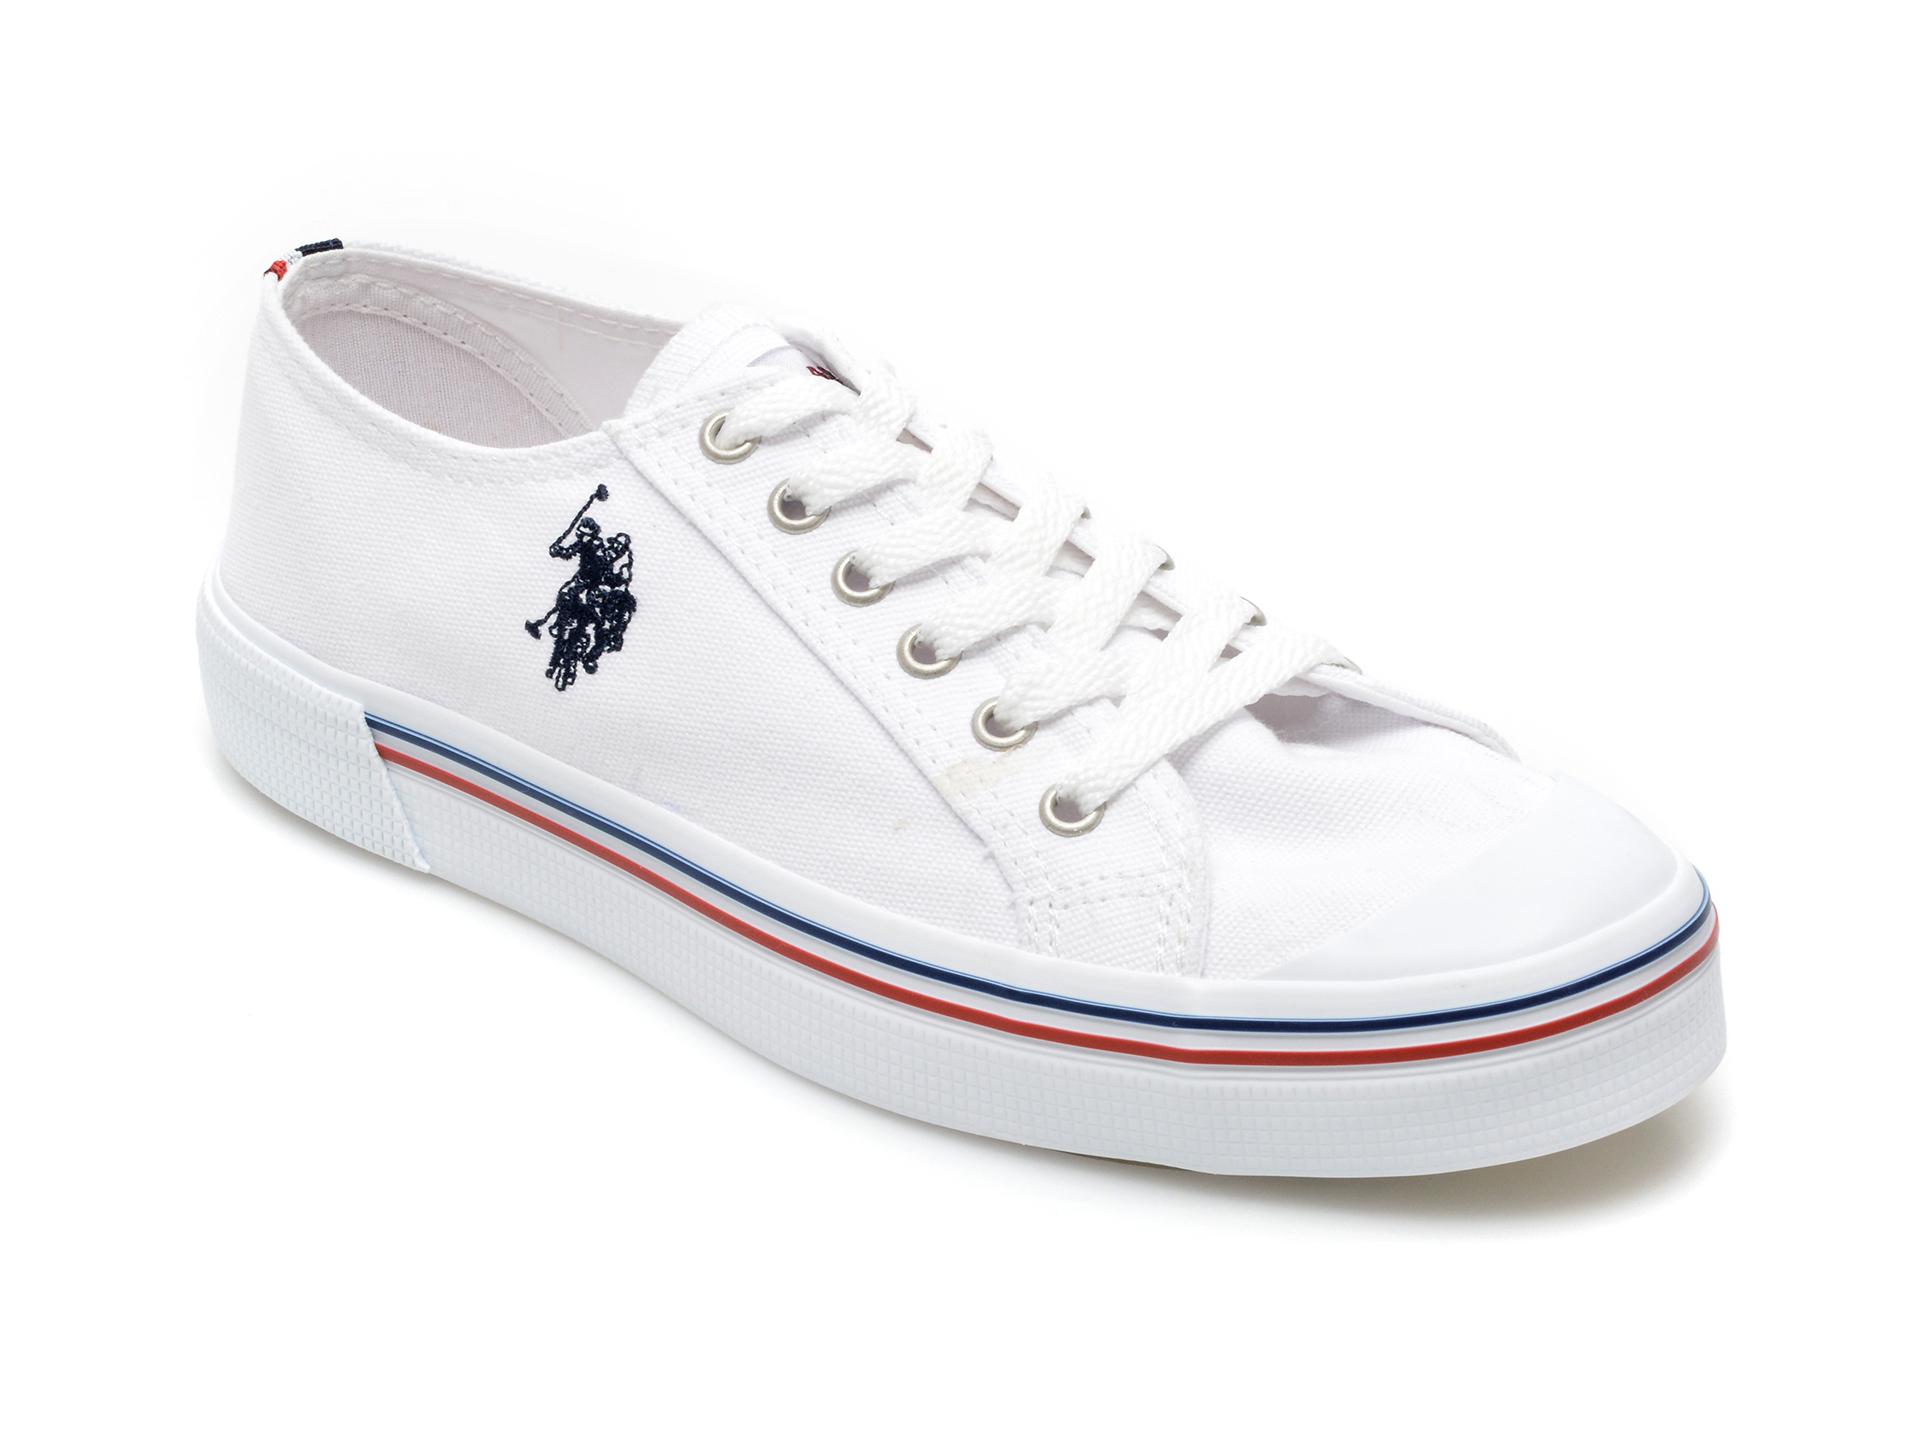 Pantofi Sport Us Polo Assn Albi, Pene1fx, Din Material Textil